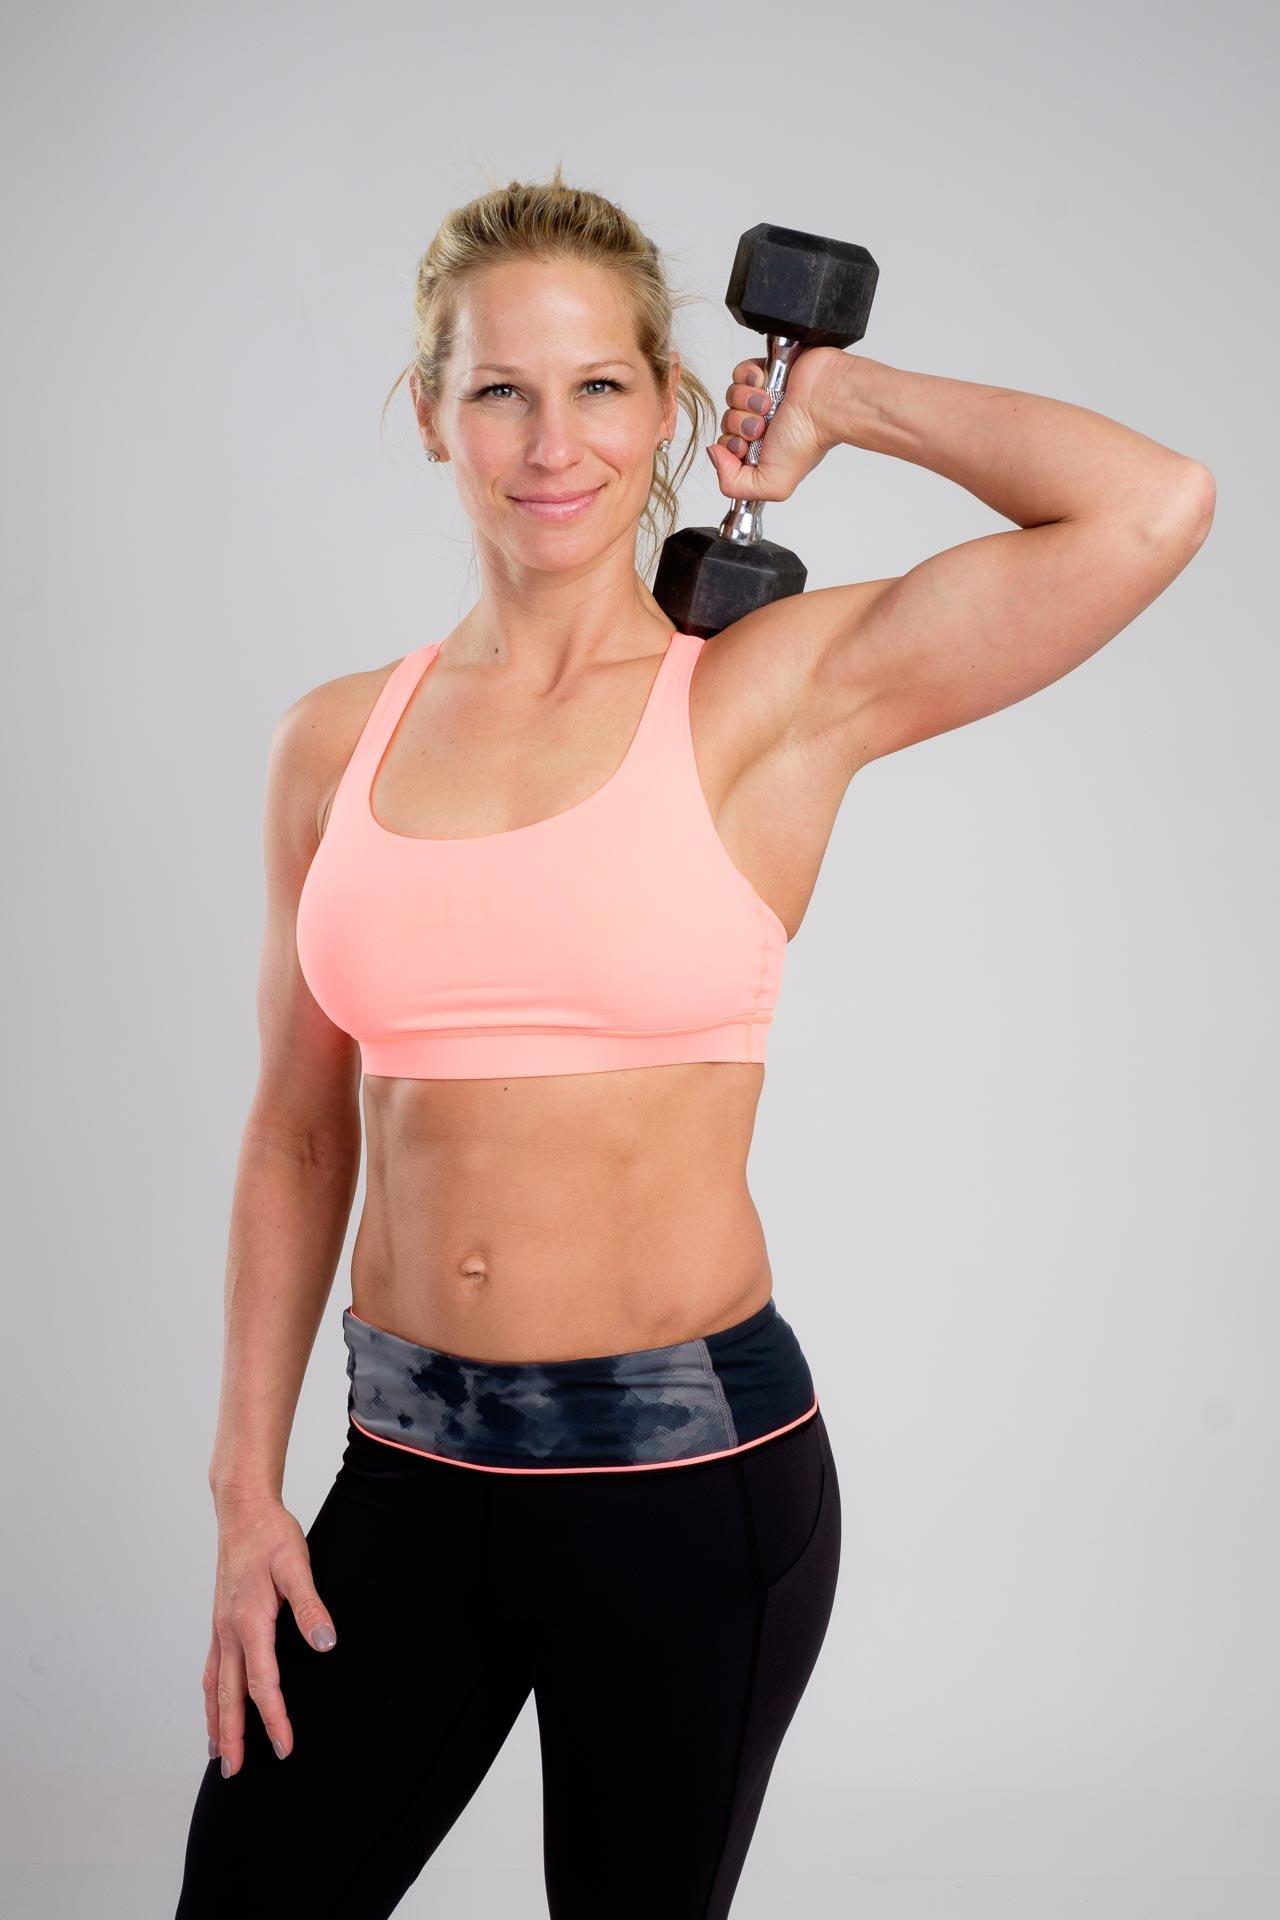 0264_SD-Fitness-Marketing-Photographer